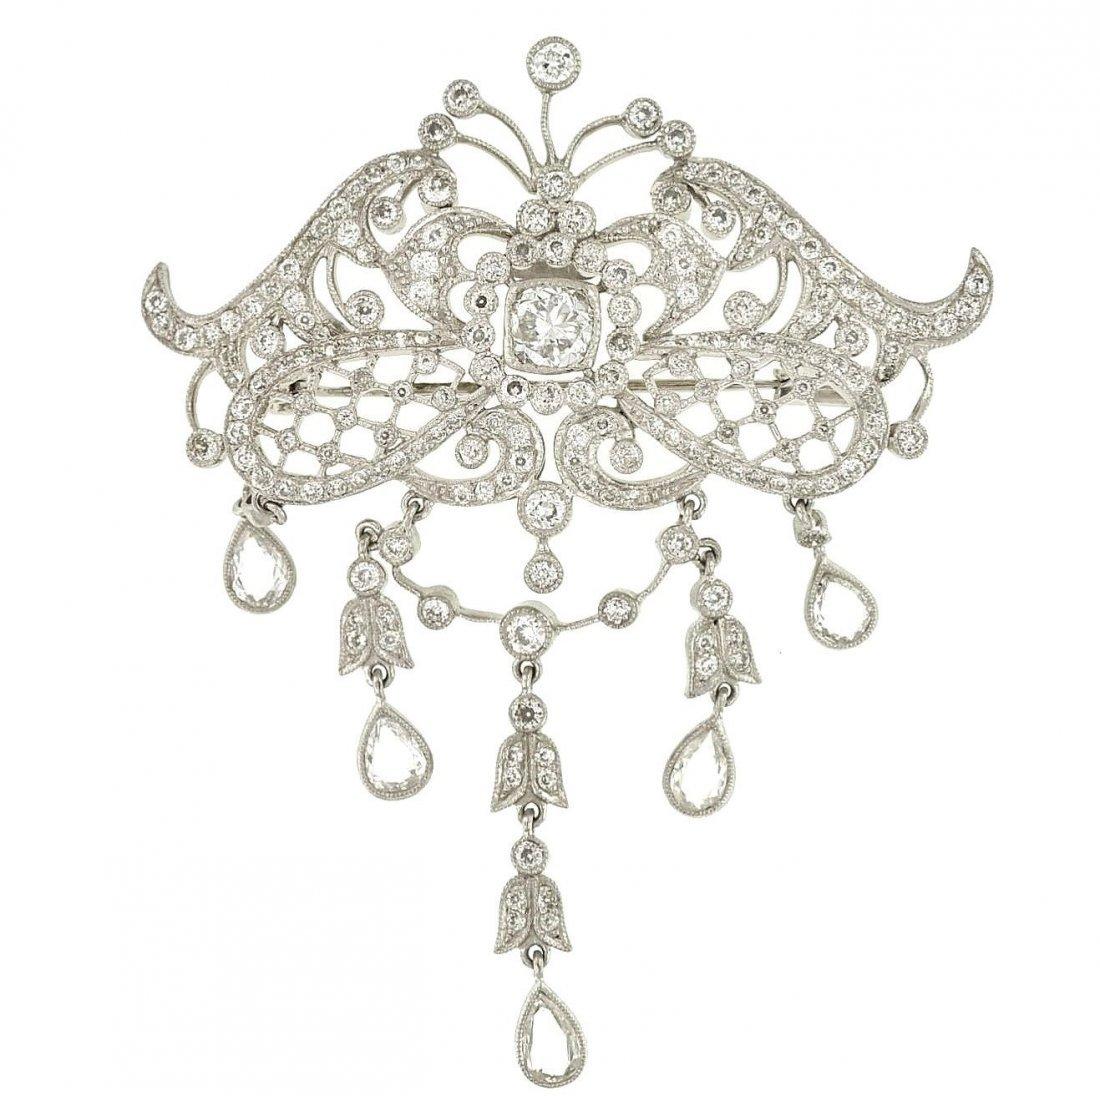 Sophia D Platinum Old European Diamond Brooch, 6.34ctw